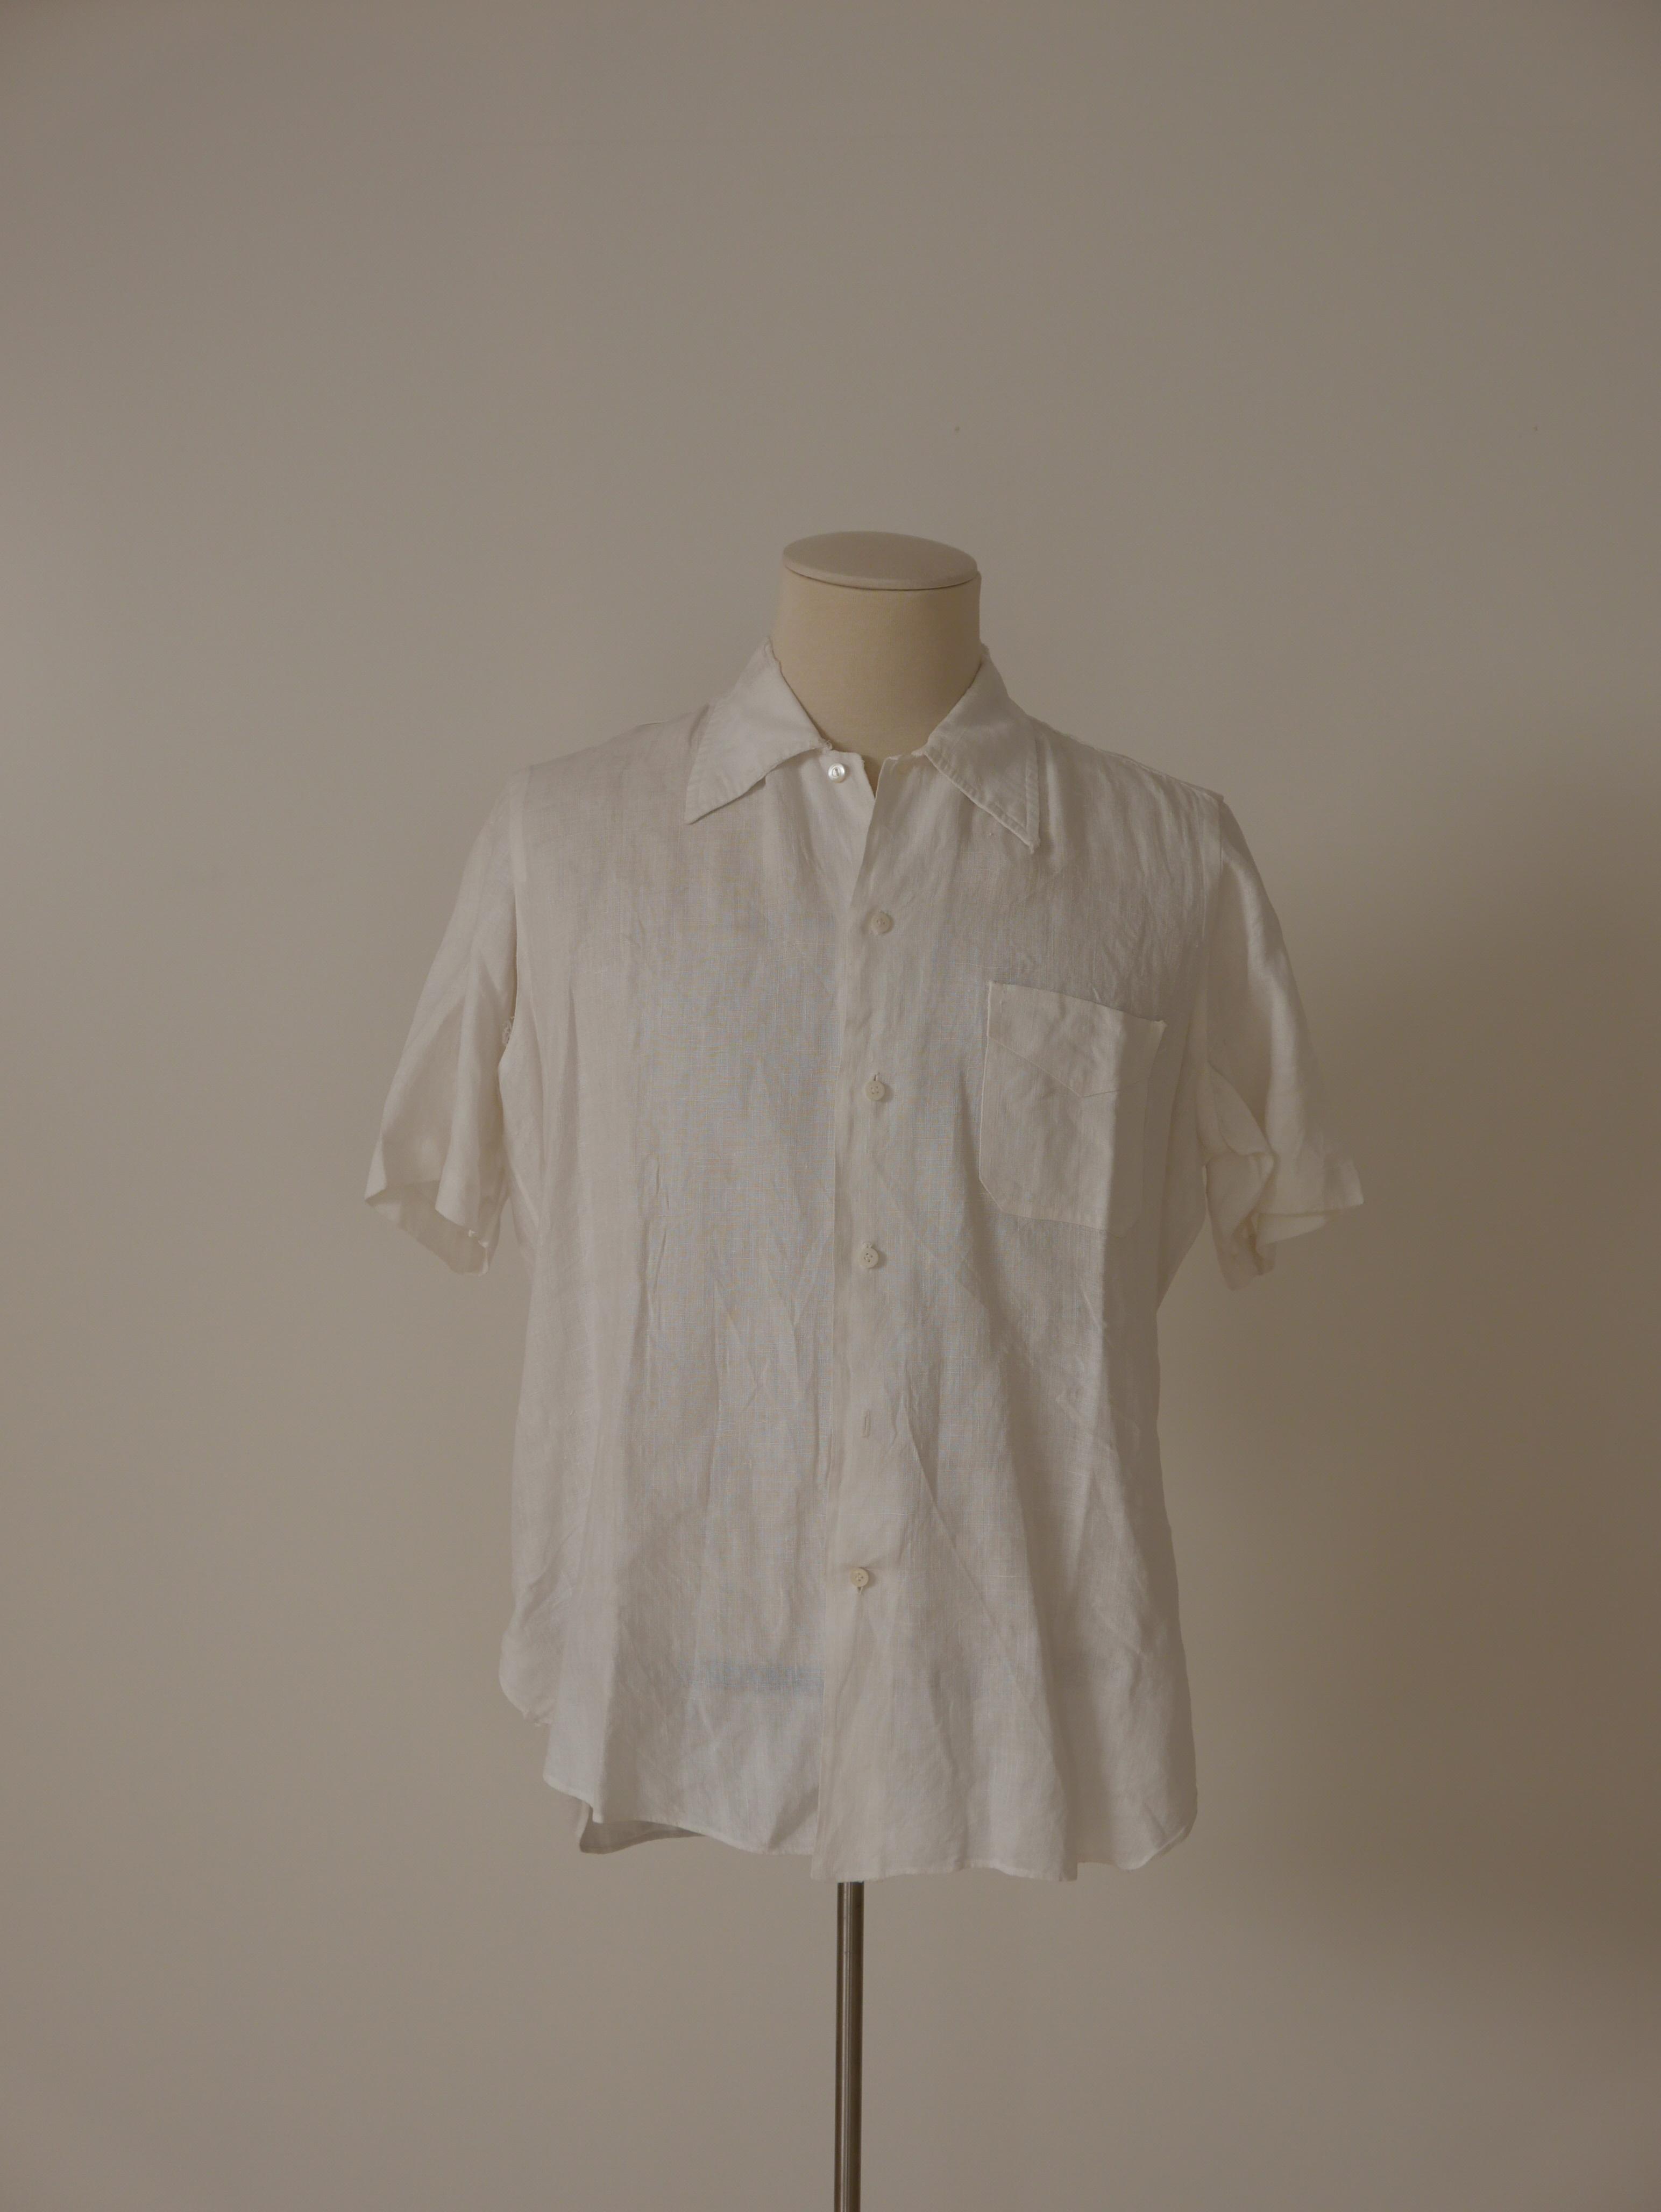 Camisa en lino blanco, de manga corta